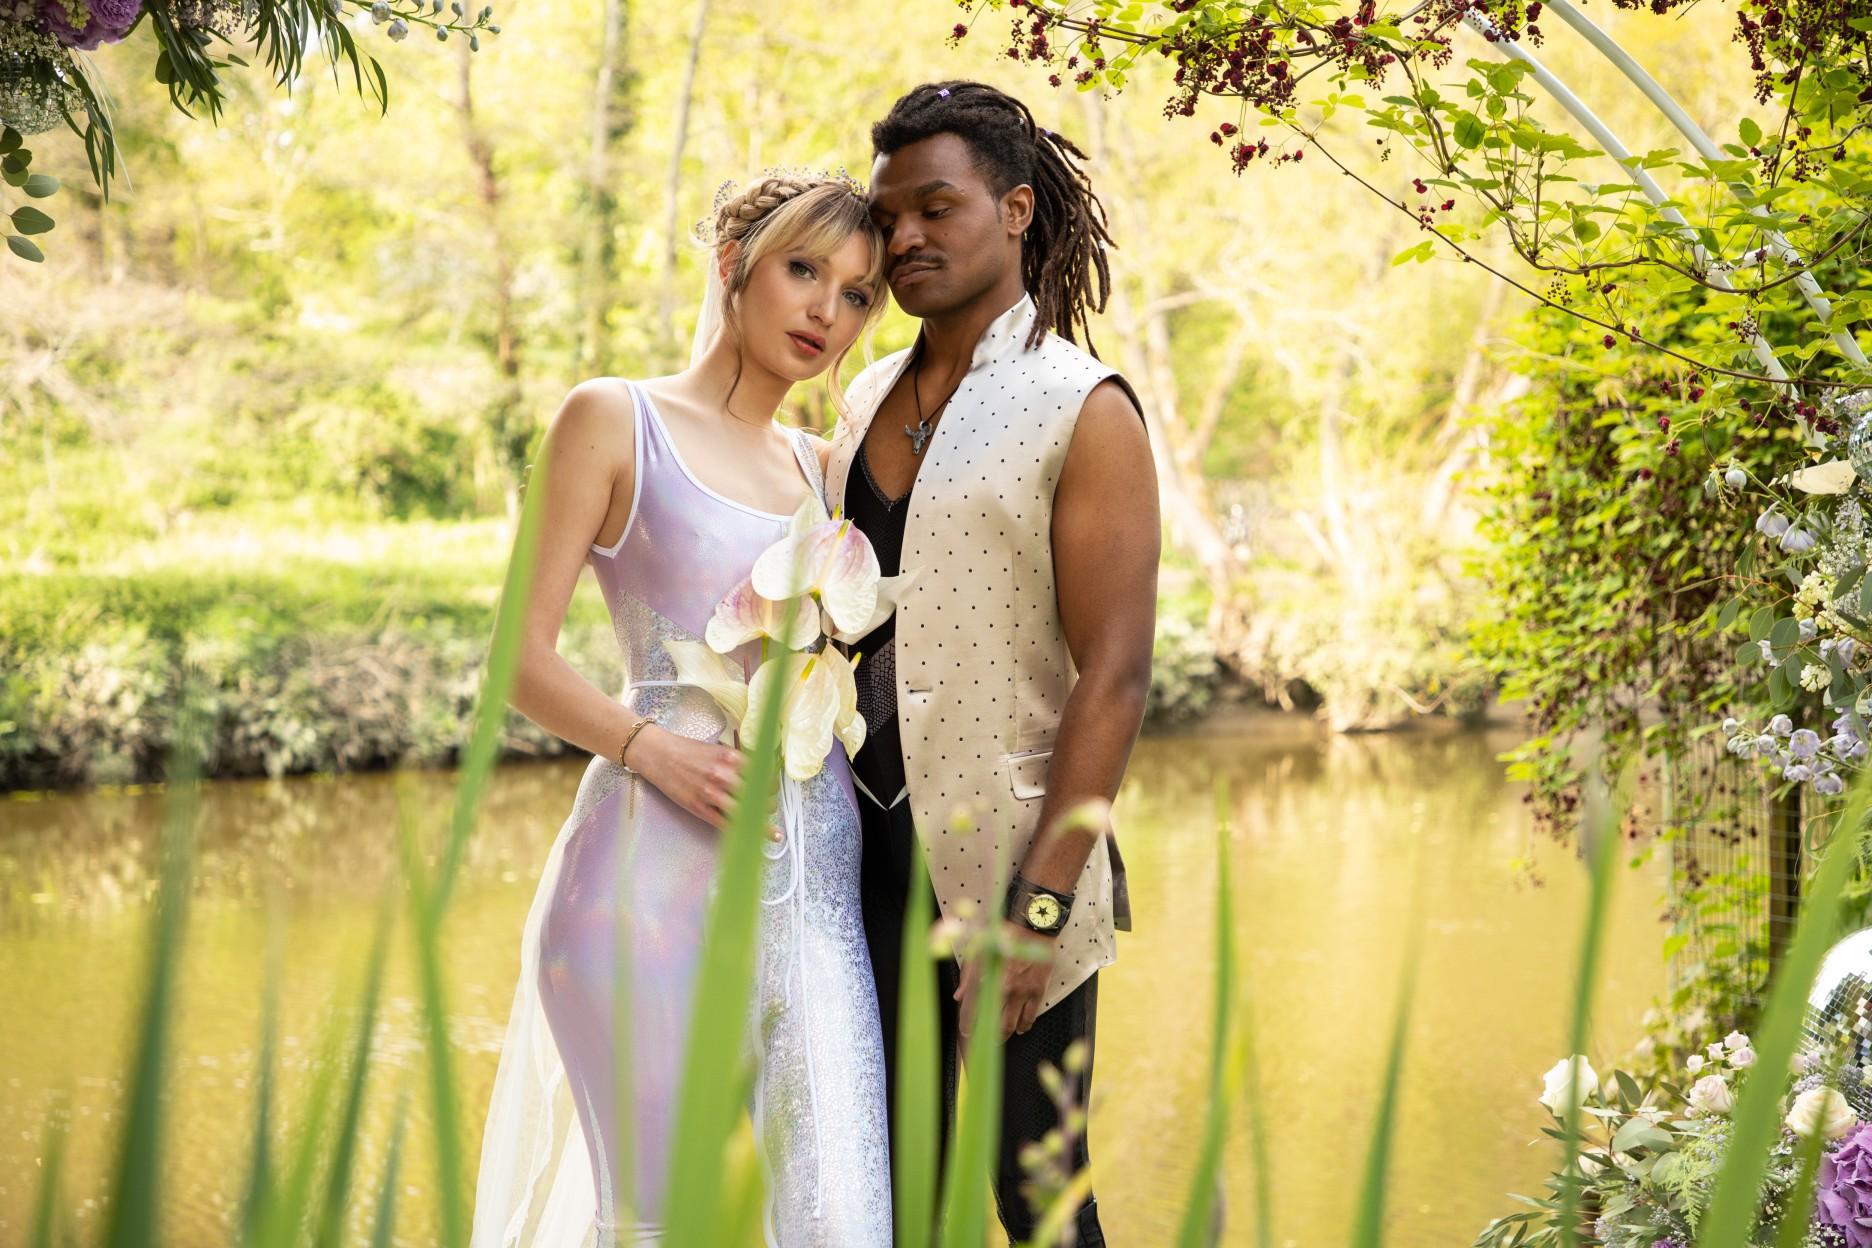 outdoor wedding ideas - modern festival wedding - unique wedding wear - wedding jumpsuit - wedding catsuit - festival bride - unique wedding wear